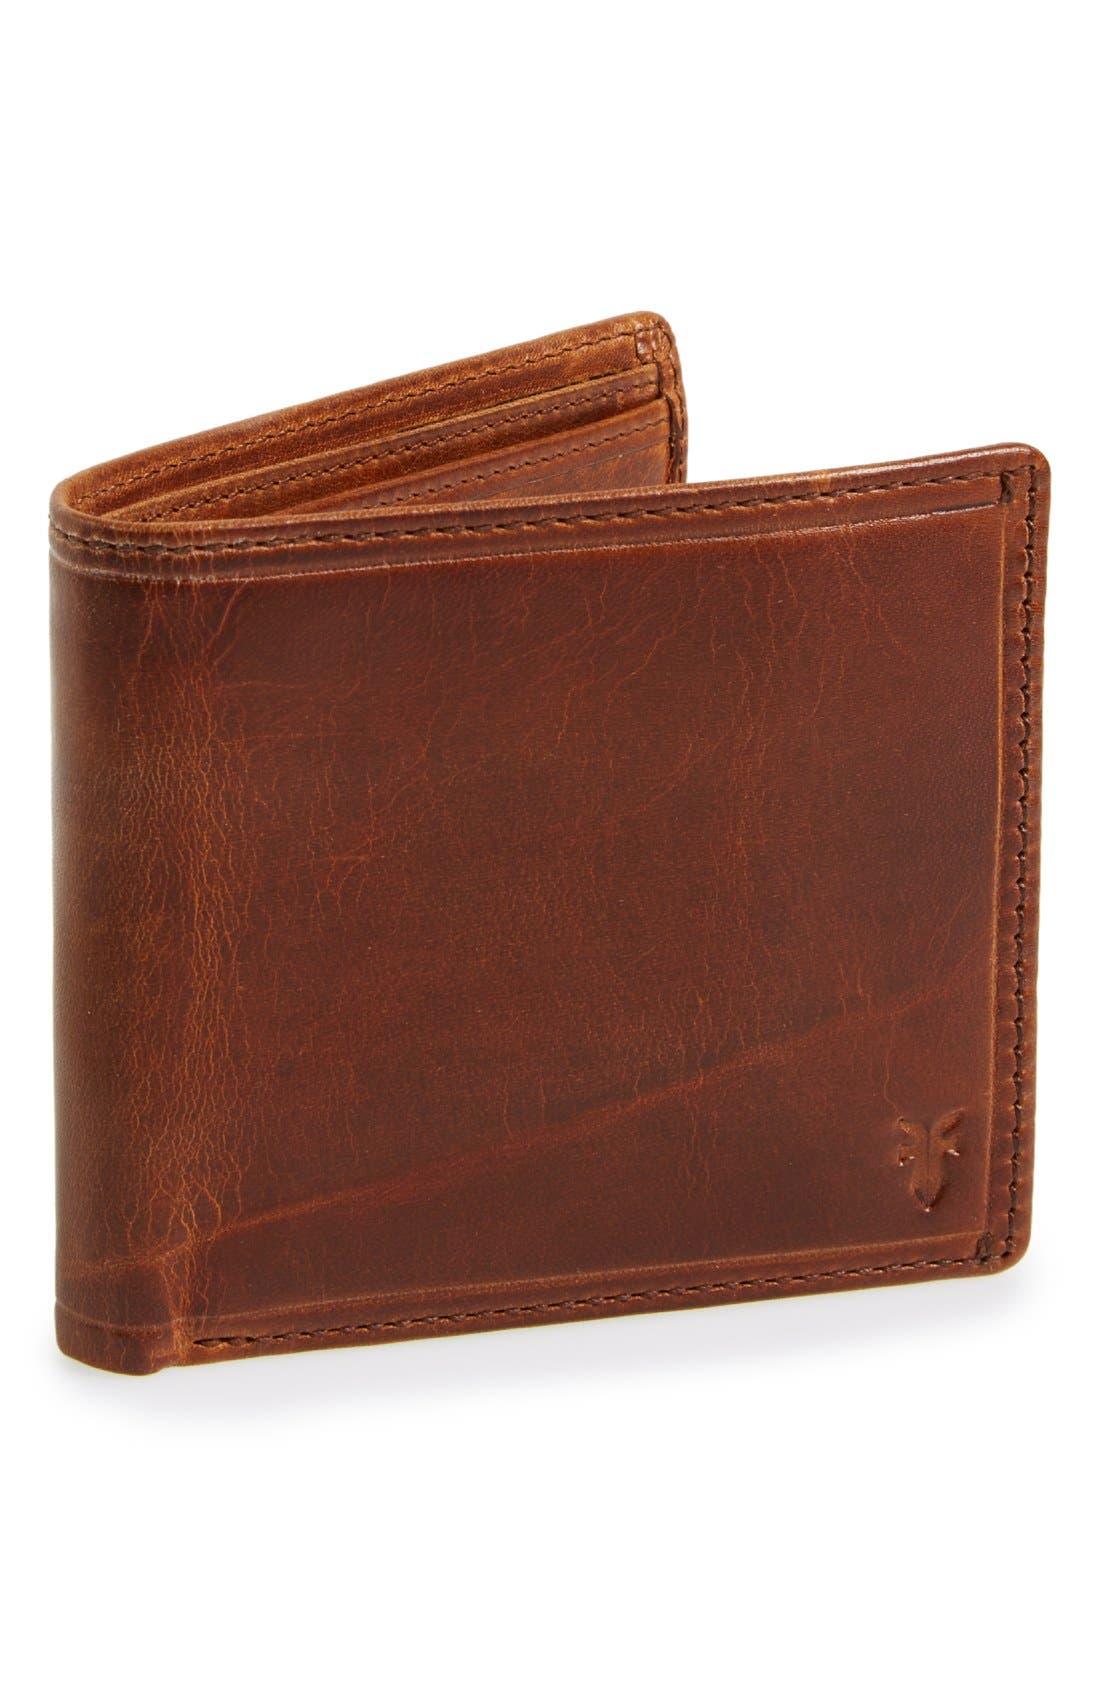 FRYE 'Logan' Leather Billfold Wallet, Main, color, COGNAC